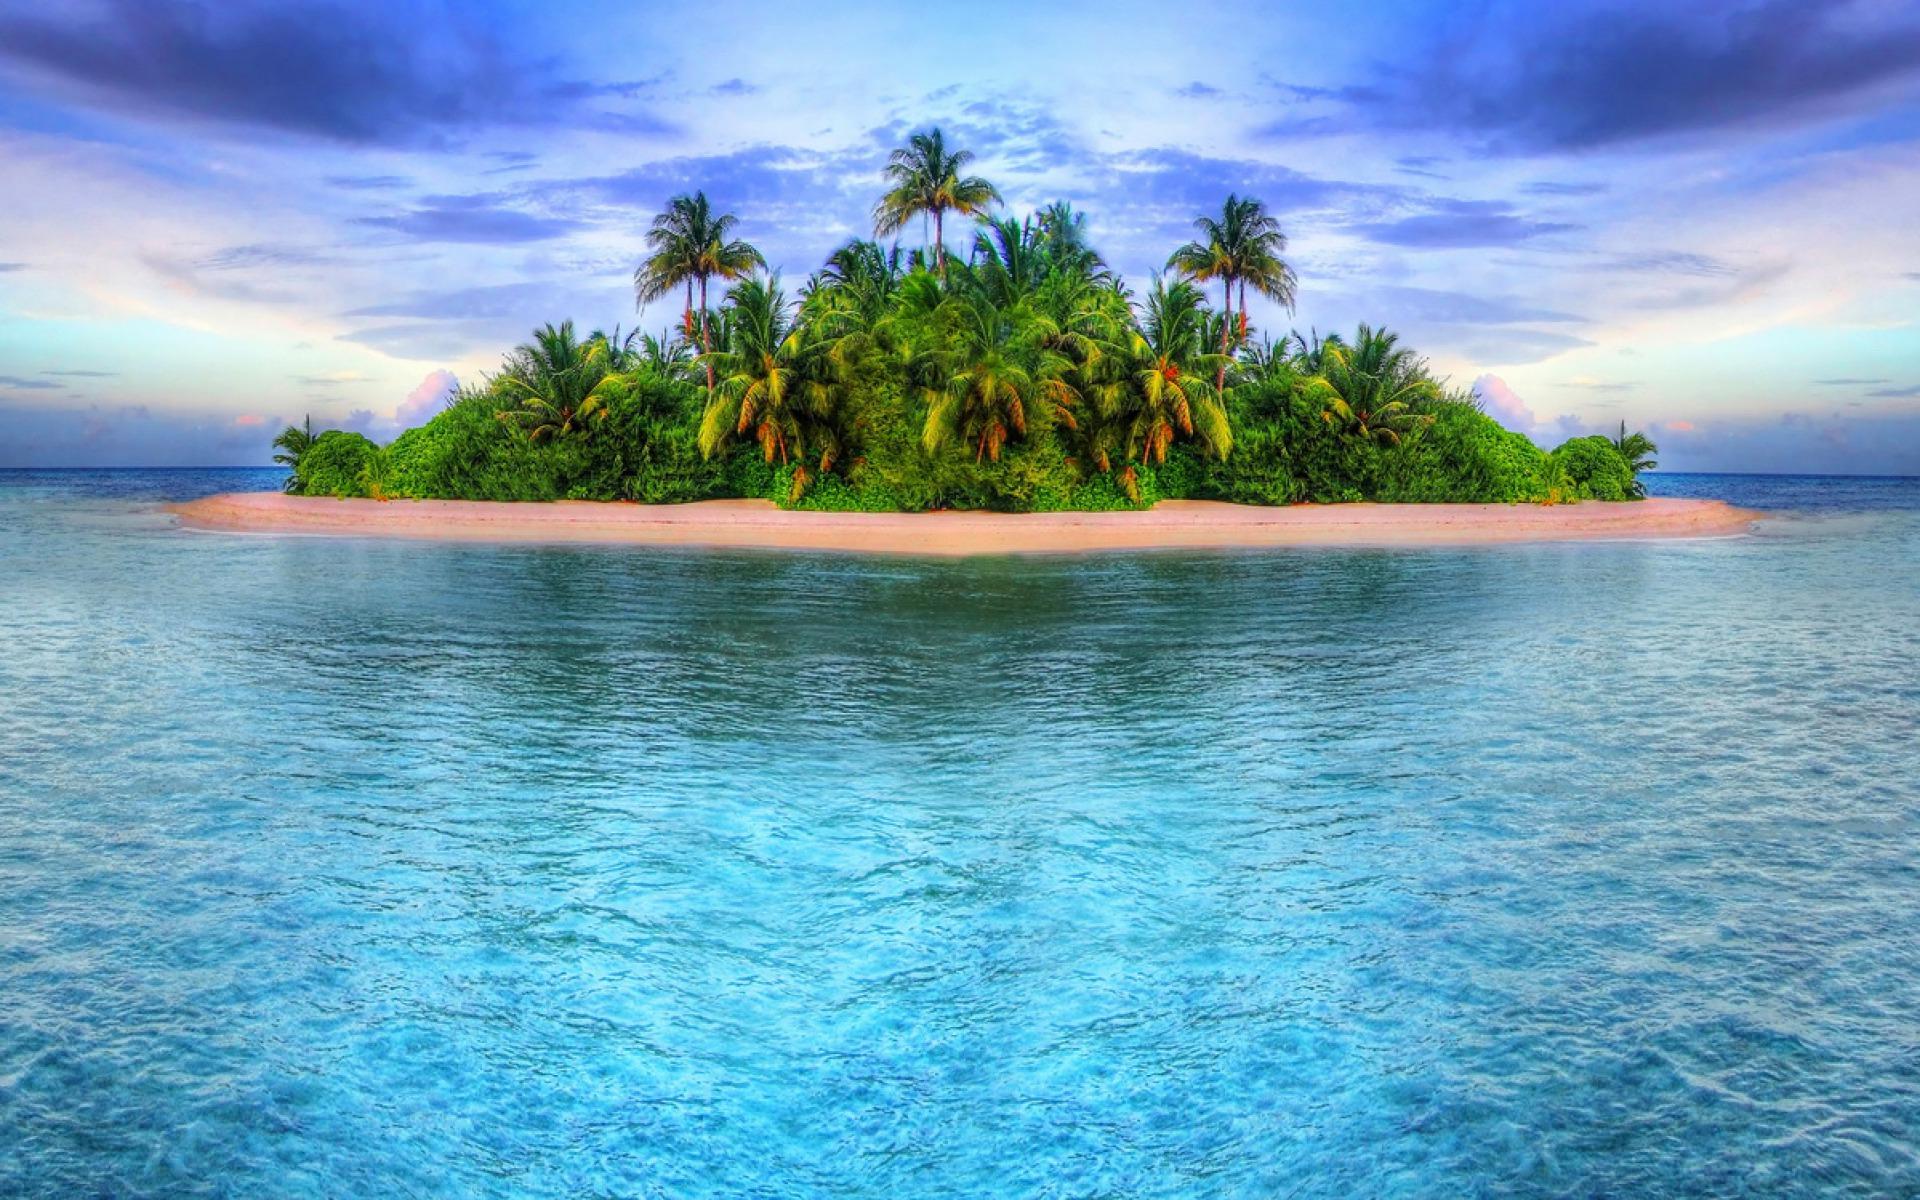 Tropical Island wallpapers | Tropical Island stock photos